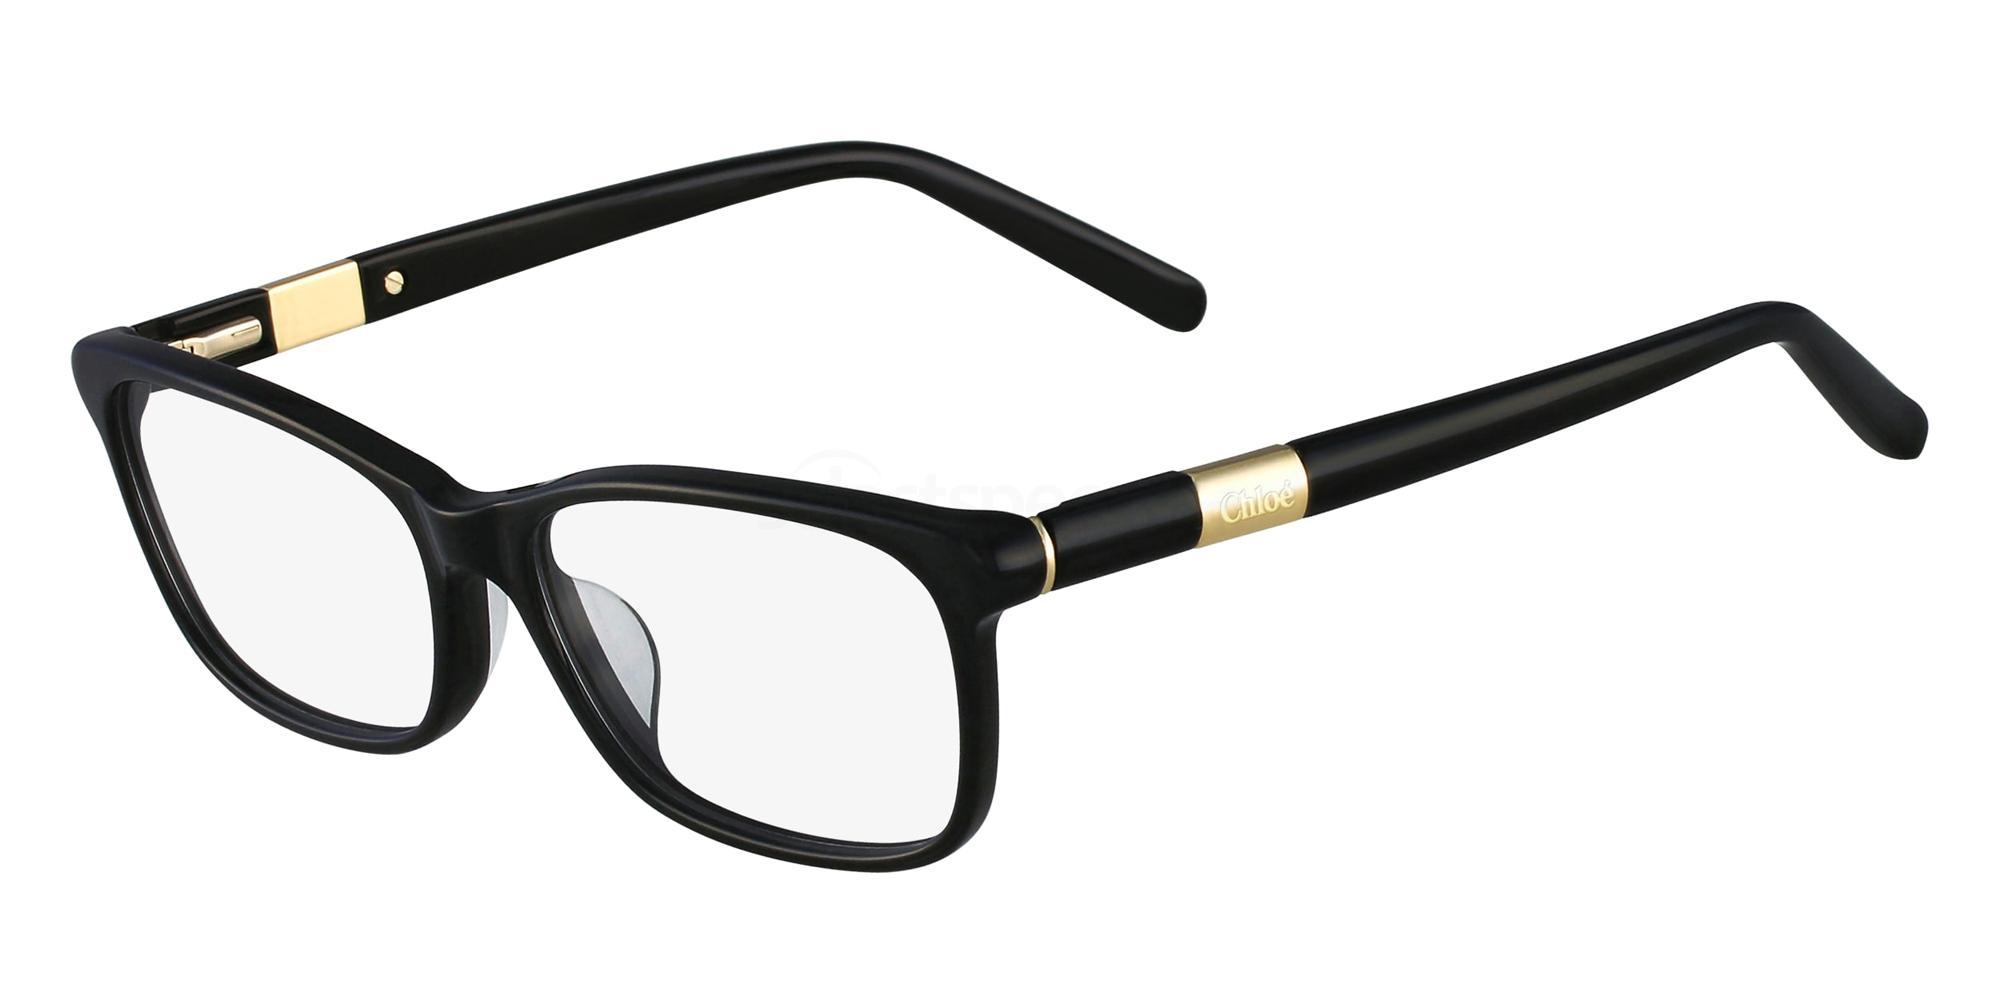 001 CE2628 Glasses, Chloe